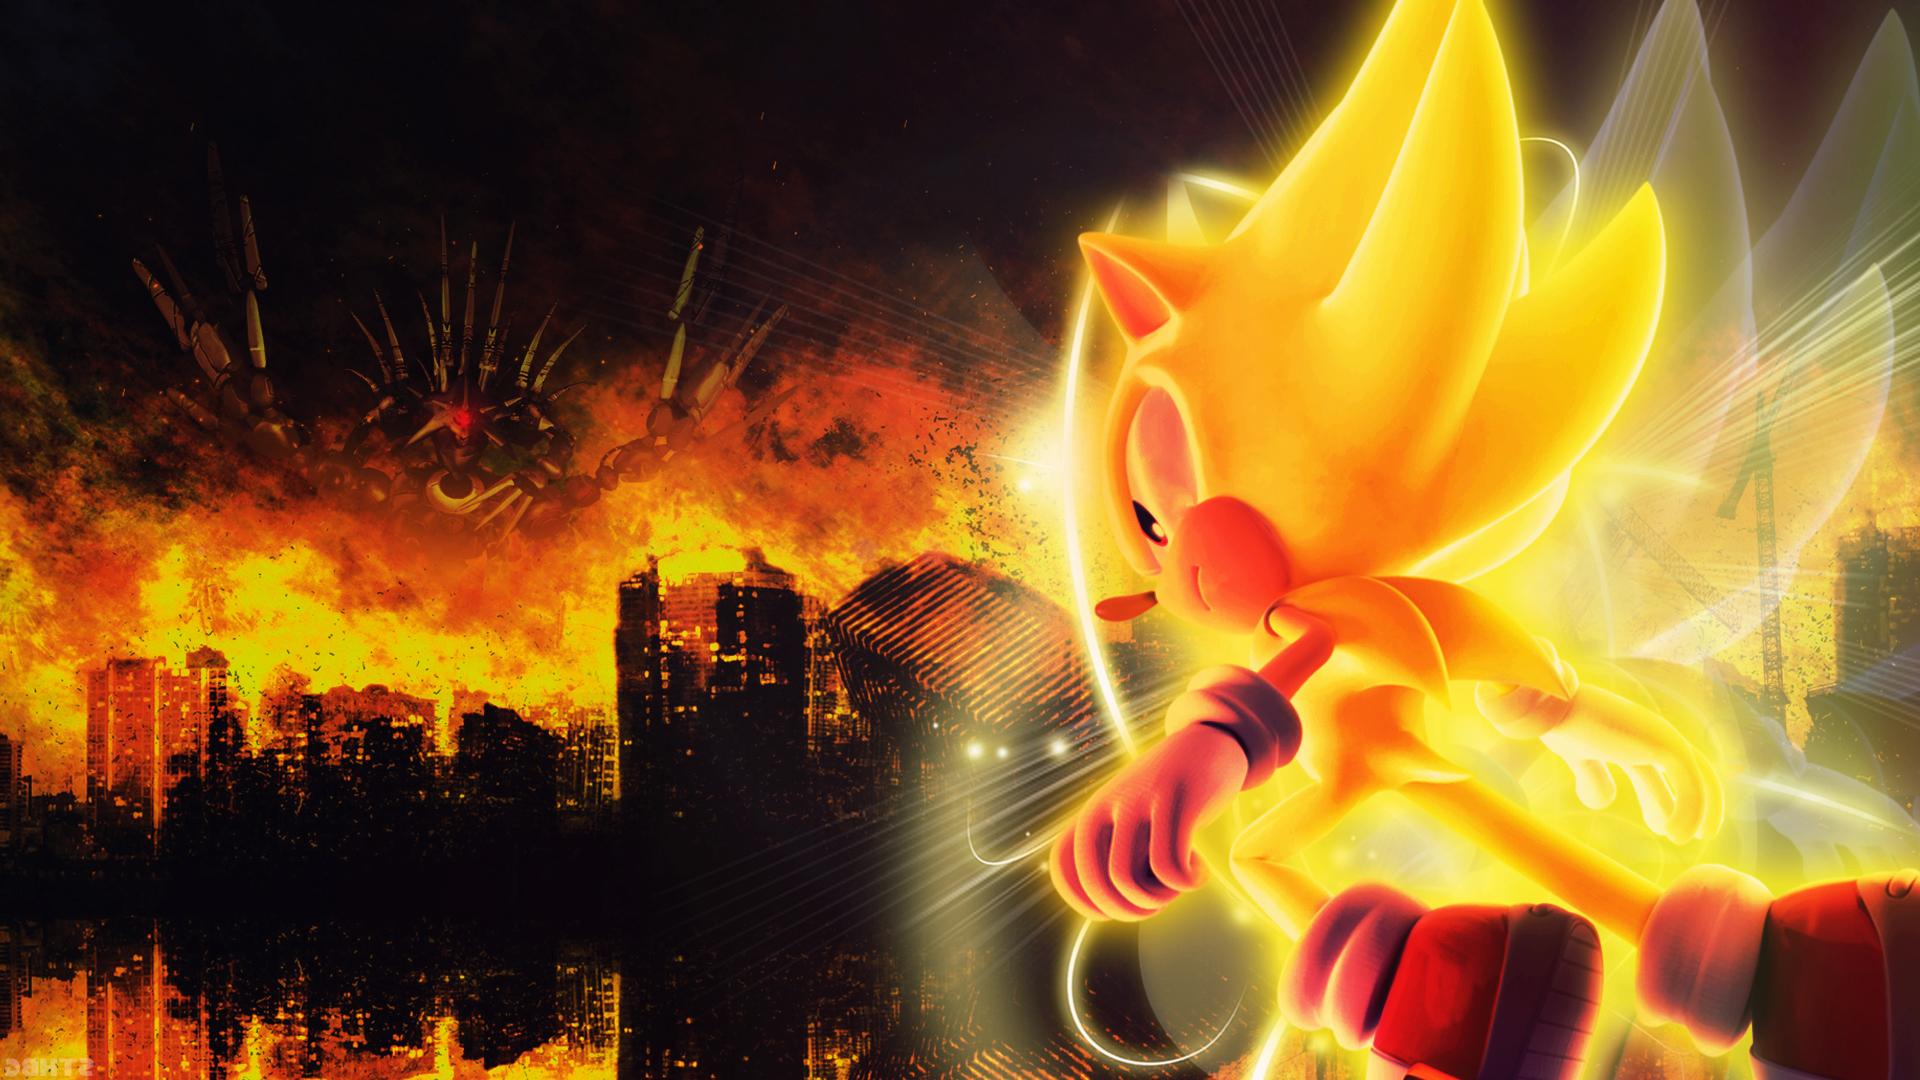 Sonic Wallpapers Favourites By Sonamyfan03 On DeviantArt